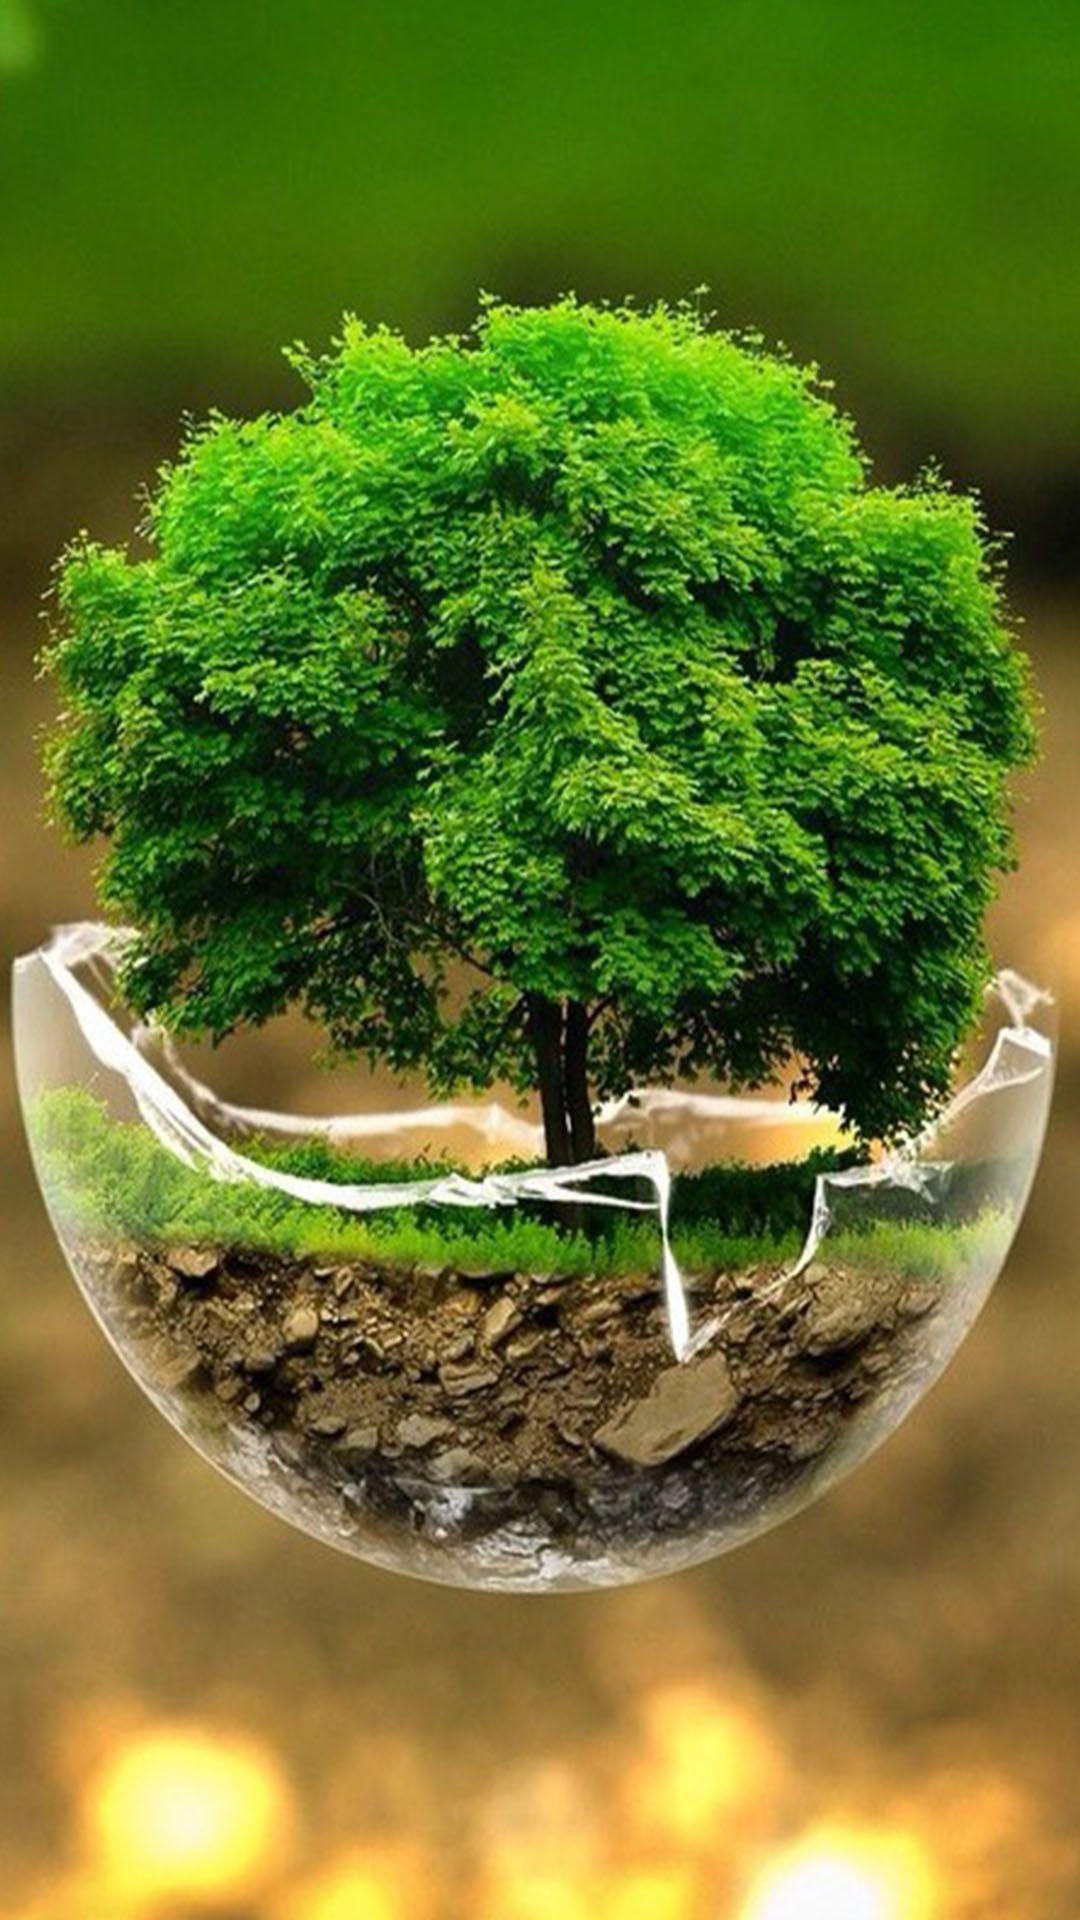 Herb Plant Vascular Plant Thyme Background, Parsley, Pot, Leaf, Backgrounds